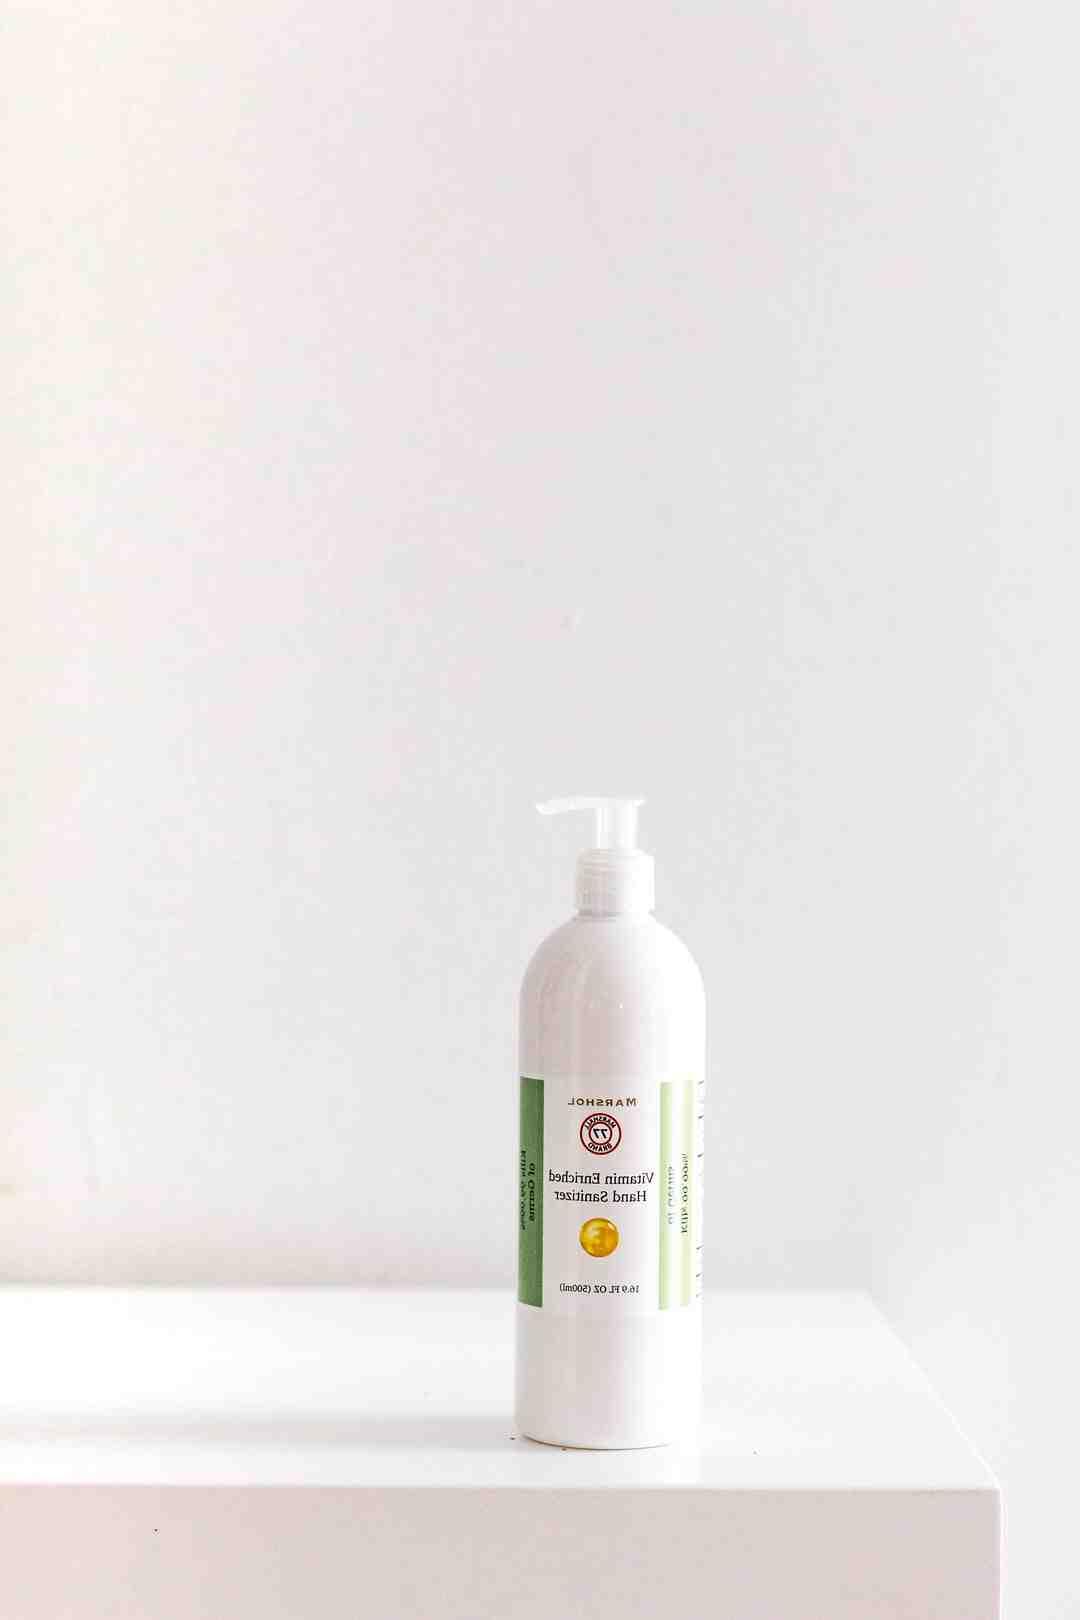 Is Laura Mercier tinted moisturizer non comedogenic?